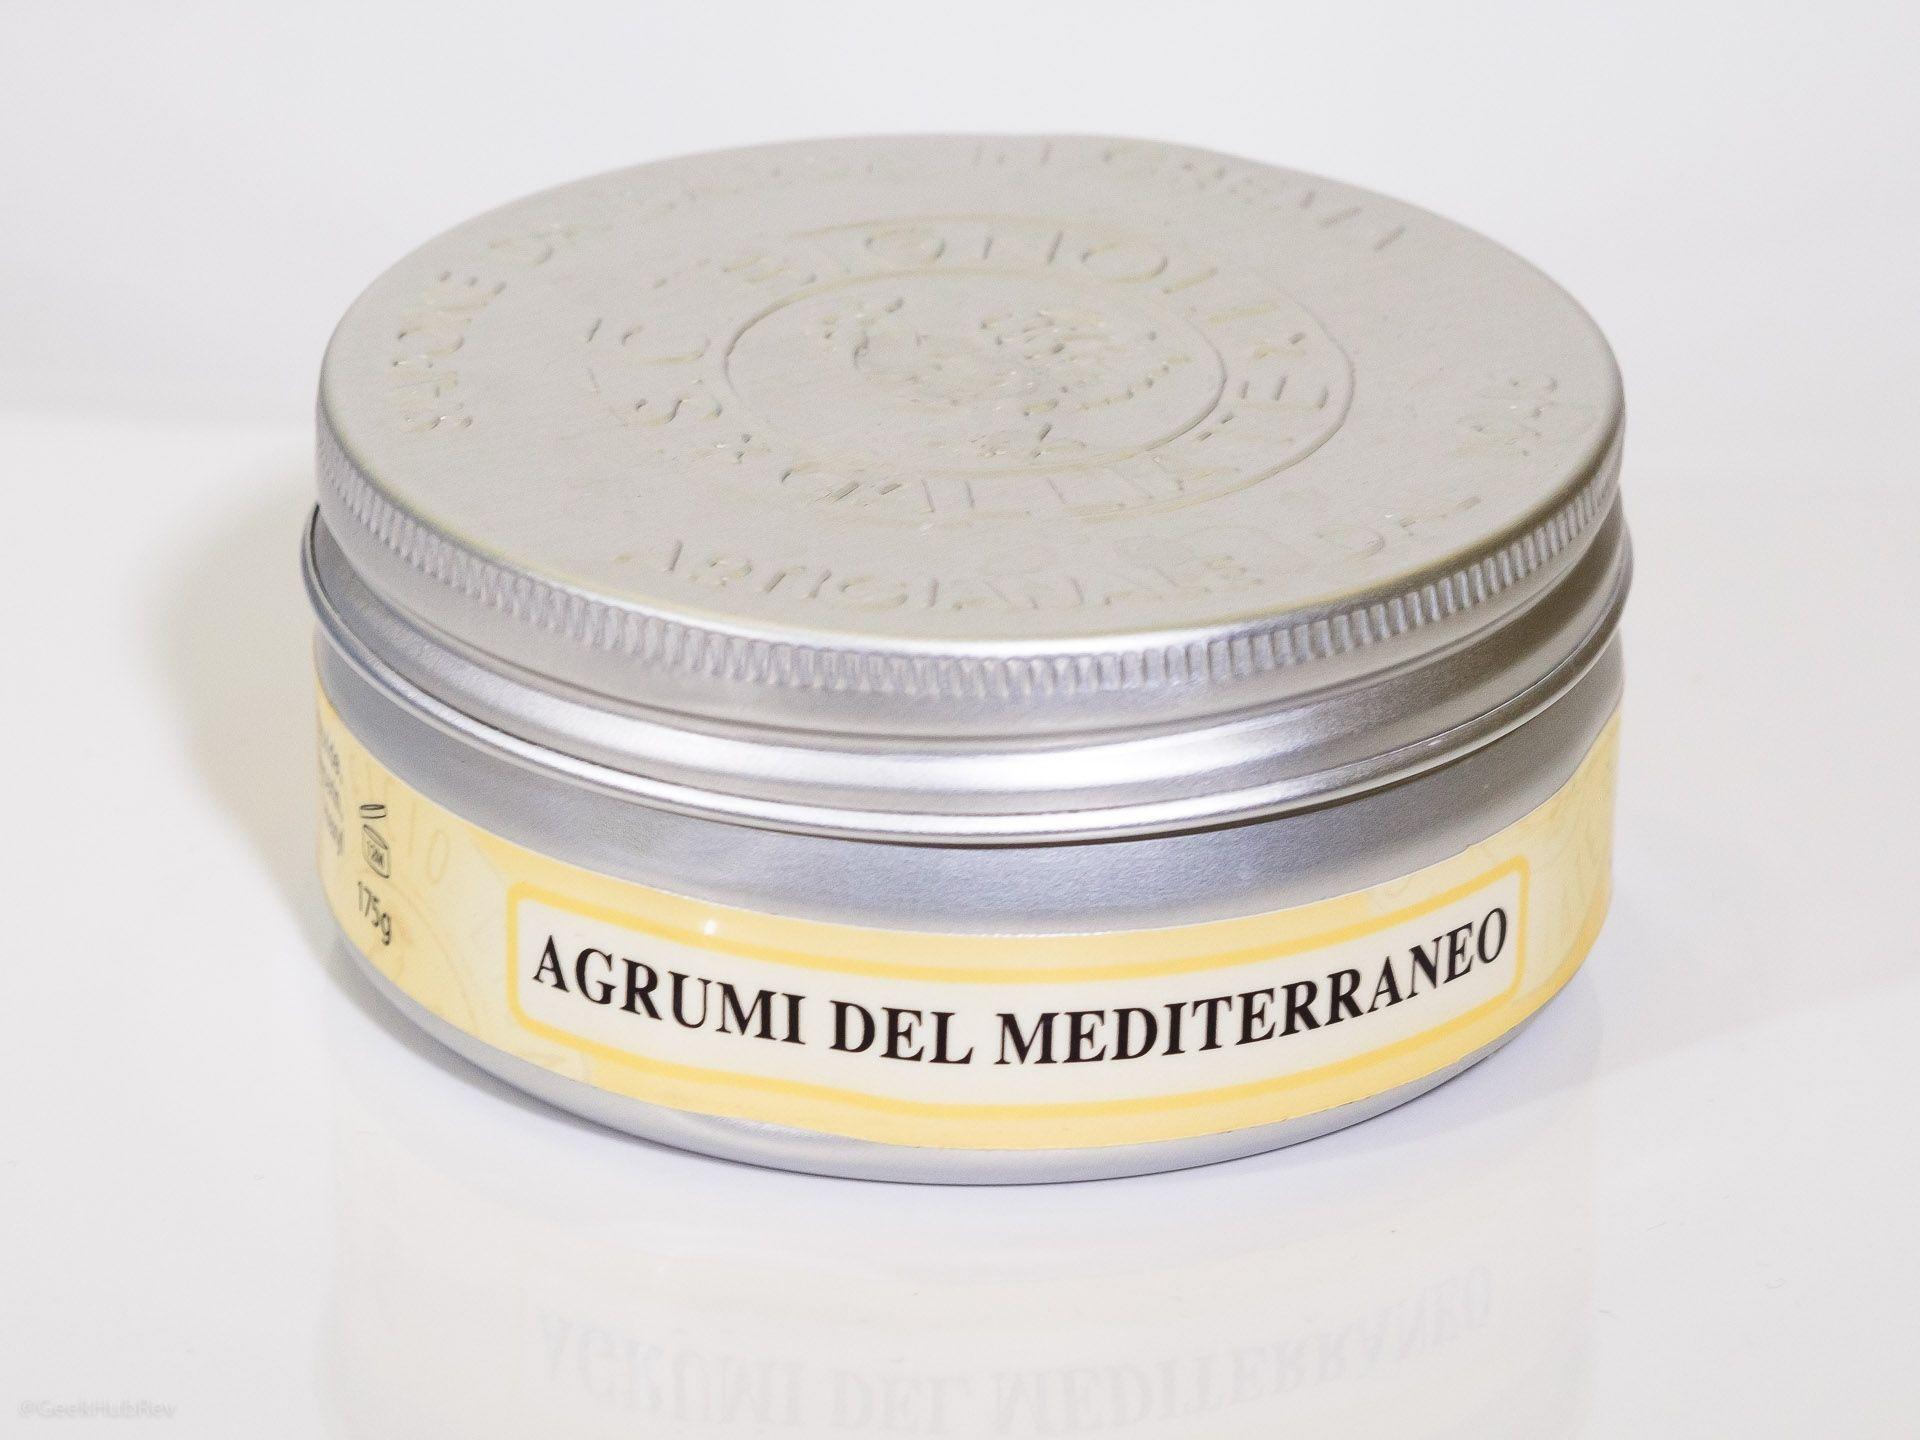 Opakowanie kremu do golenia Saponificio Bignoli Agrumi del Mediterraneo Shaving Cream